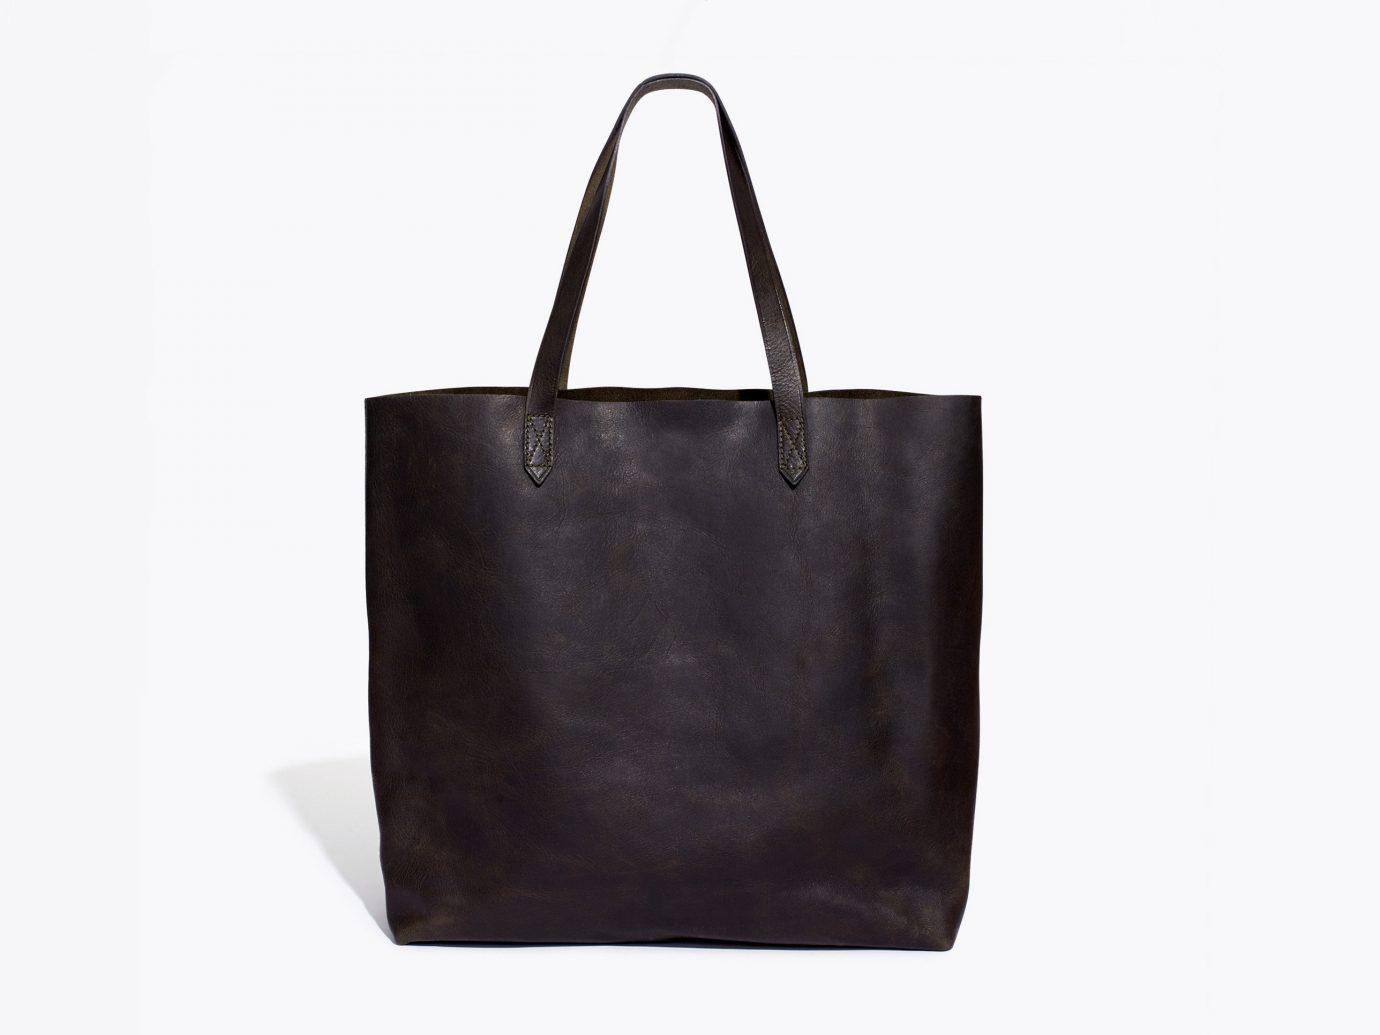 Style + Design handbag accessory bag indoor tote bag leather brown fashion accessory case shoulder bag brand textile